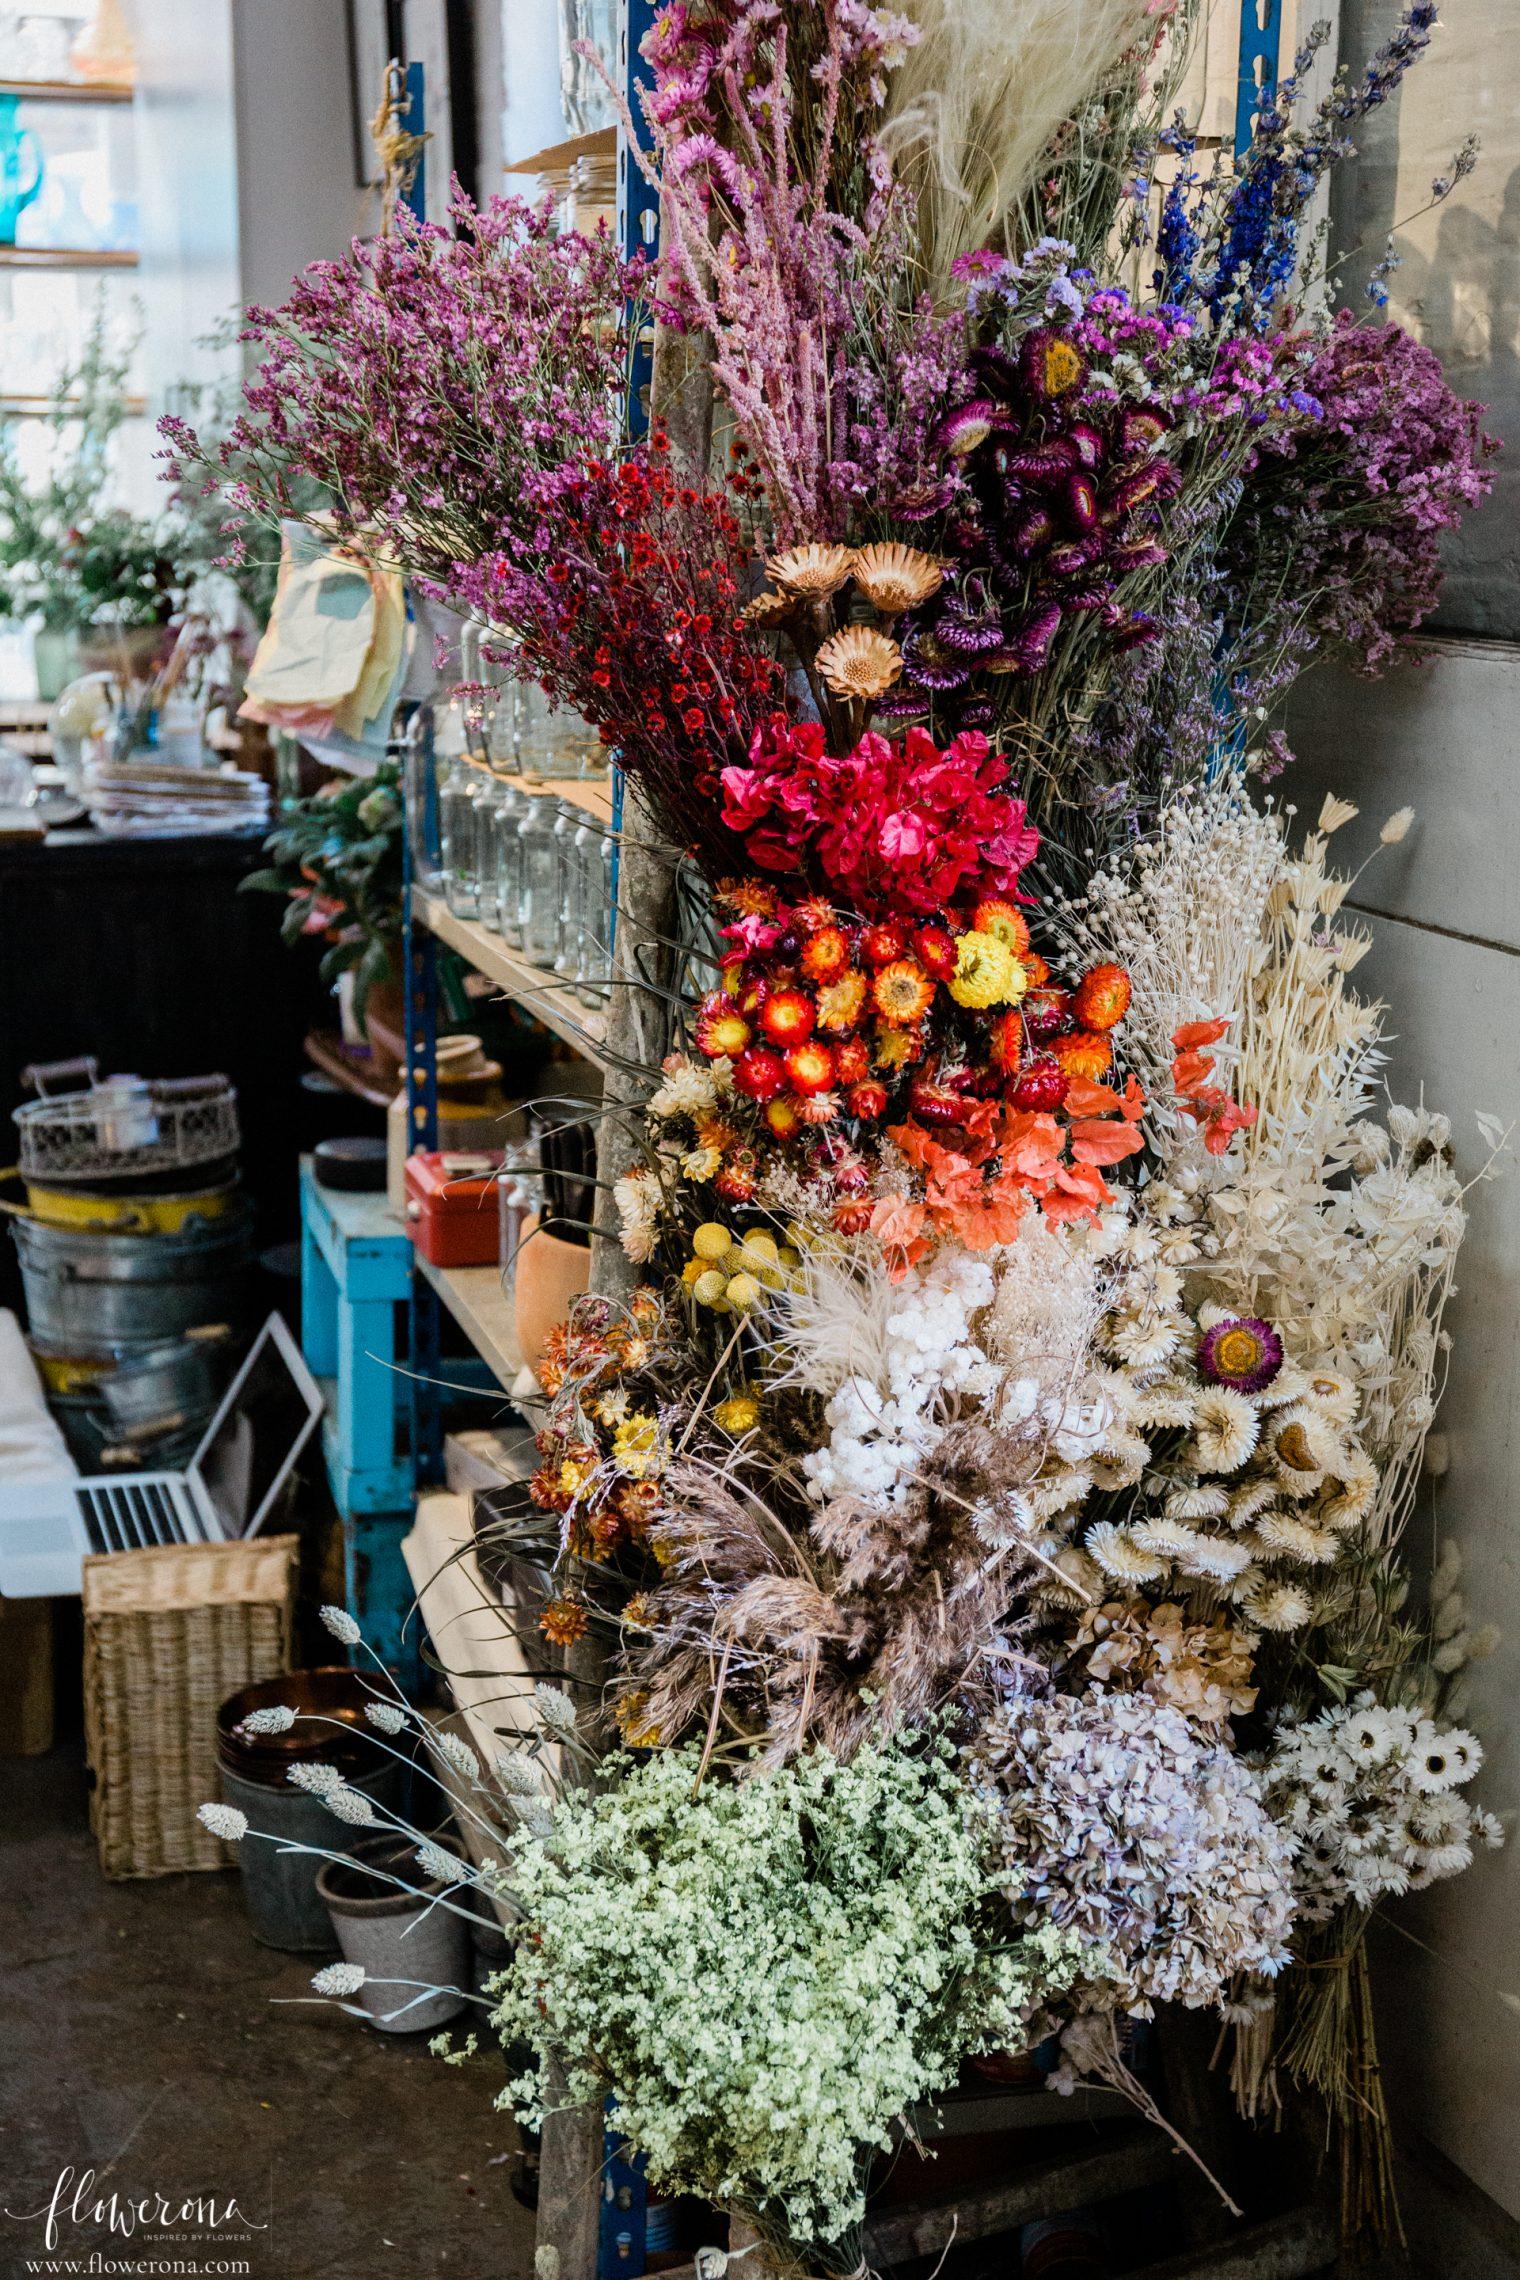 Dried Flowers at the JamJar Flowers Studio